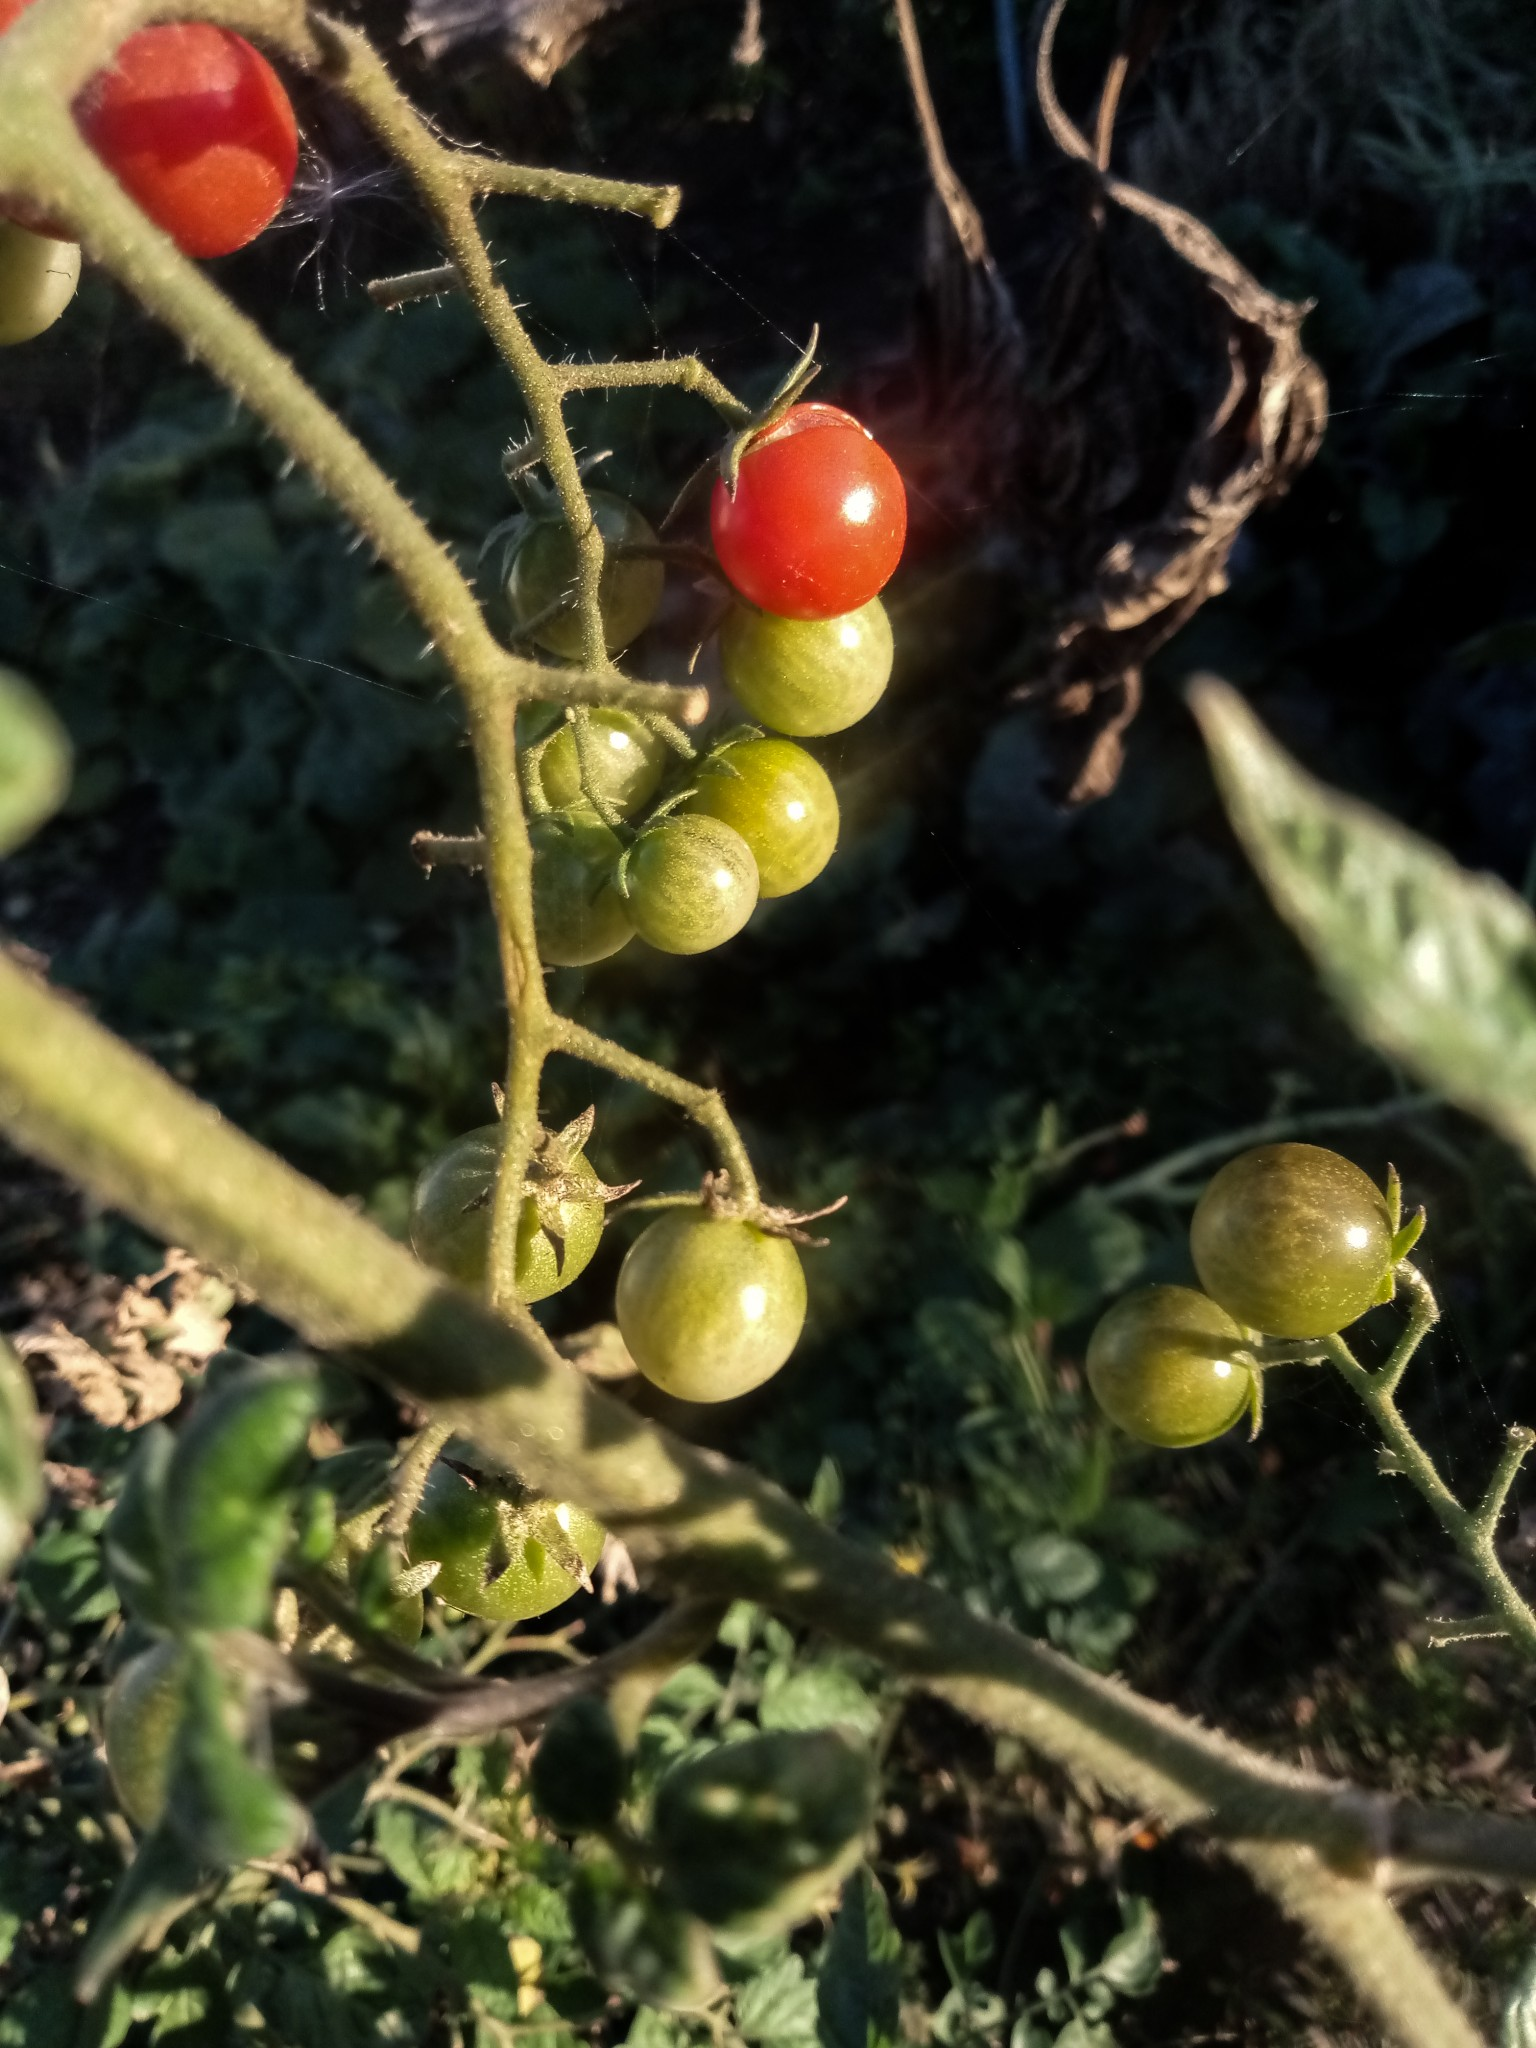 Cherry tomatoes photo 7